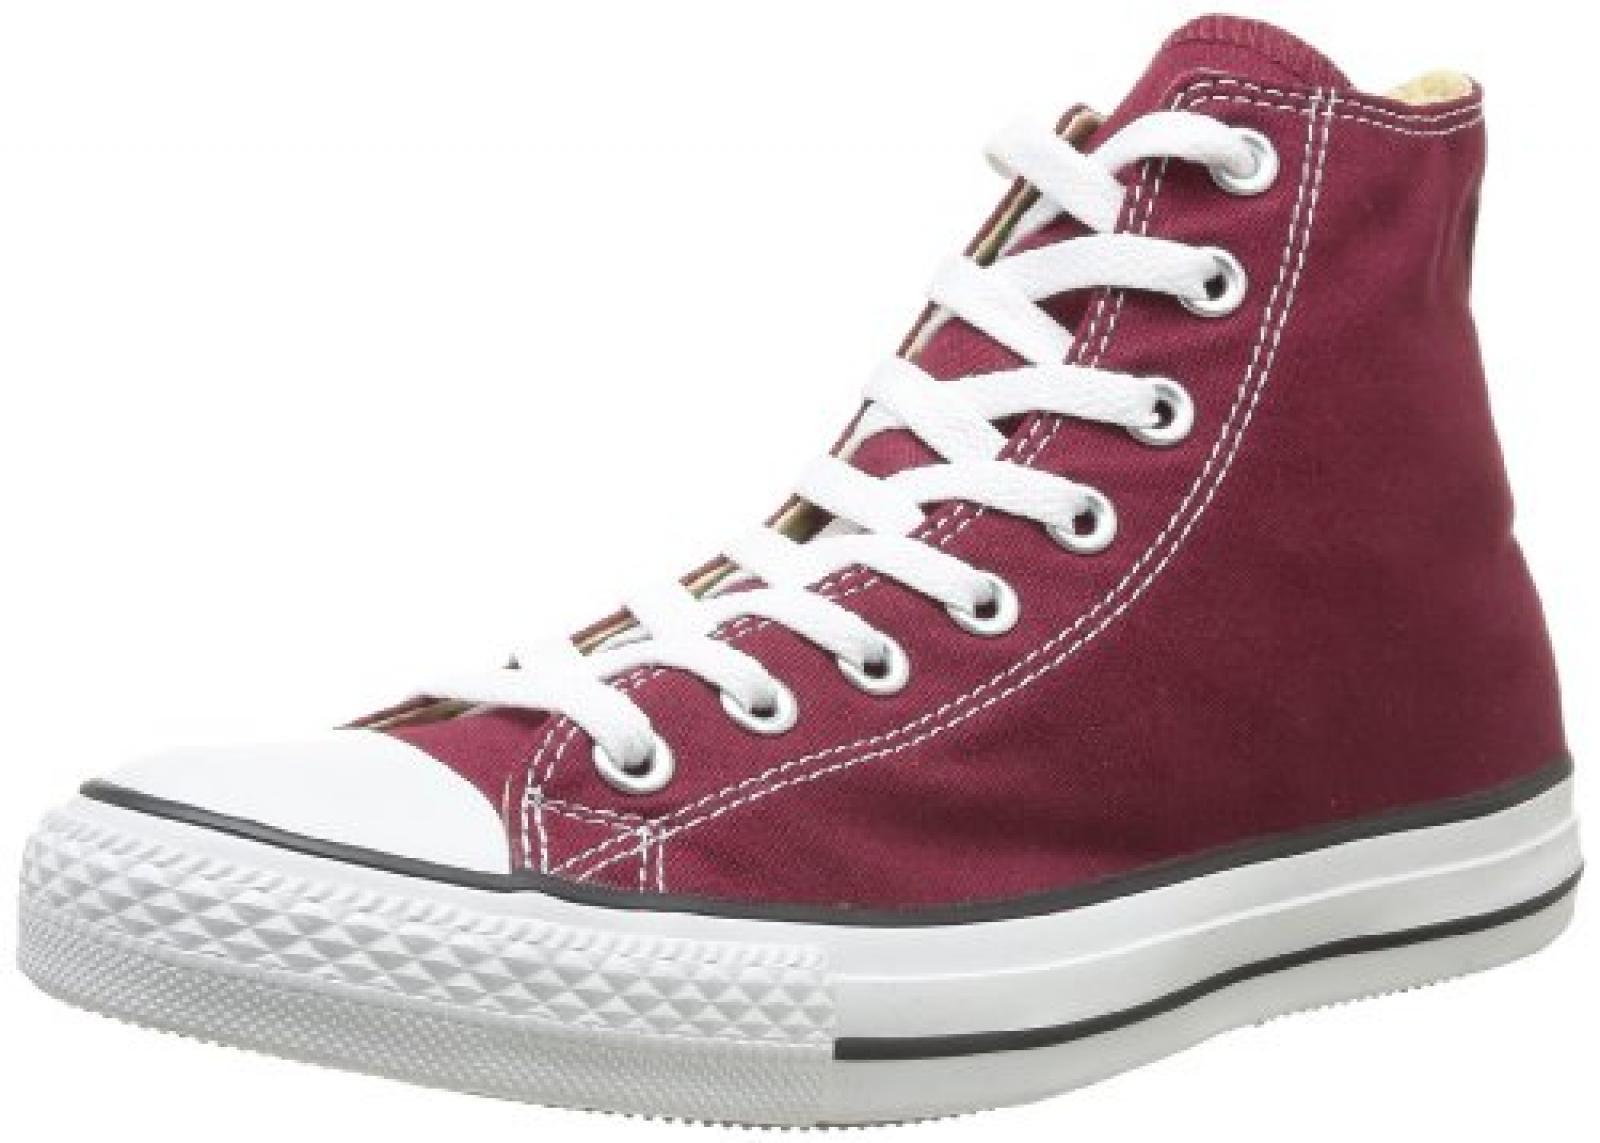 Converse AS HI CAN OPTIC. WHT M7650, Unisex-Erwachsene Sneaker